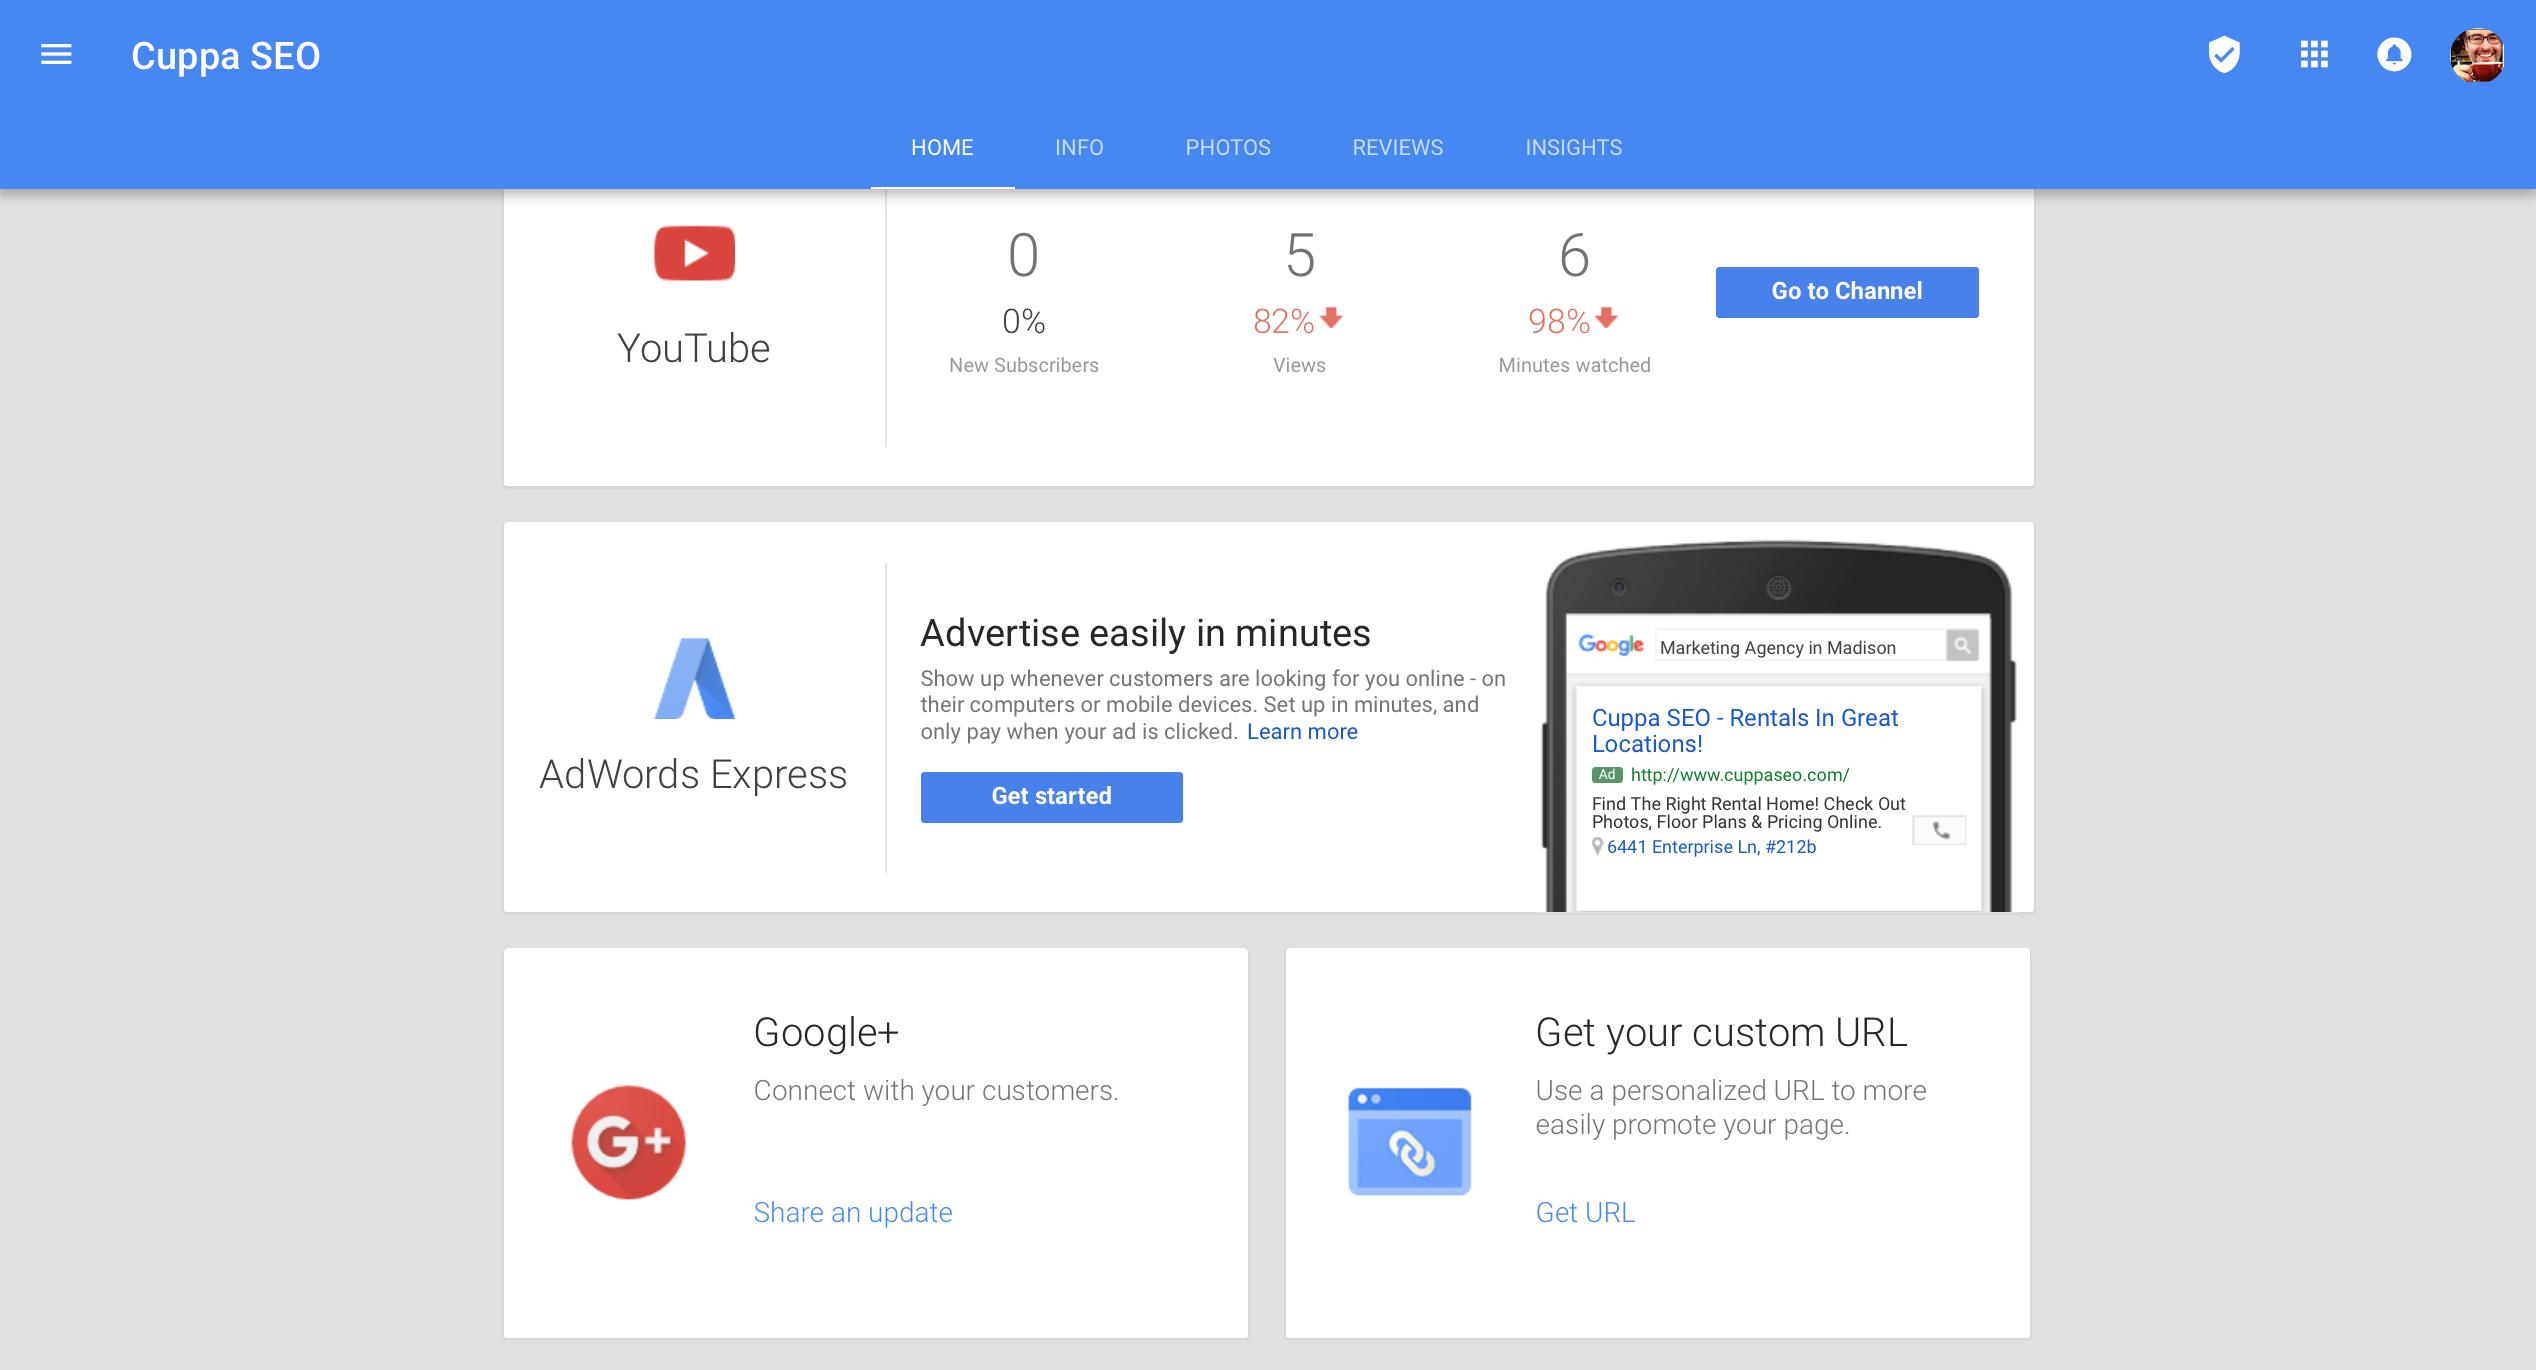 Google My Business & Google Plus Listing